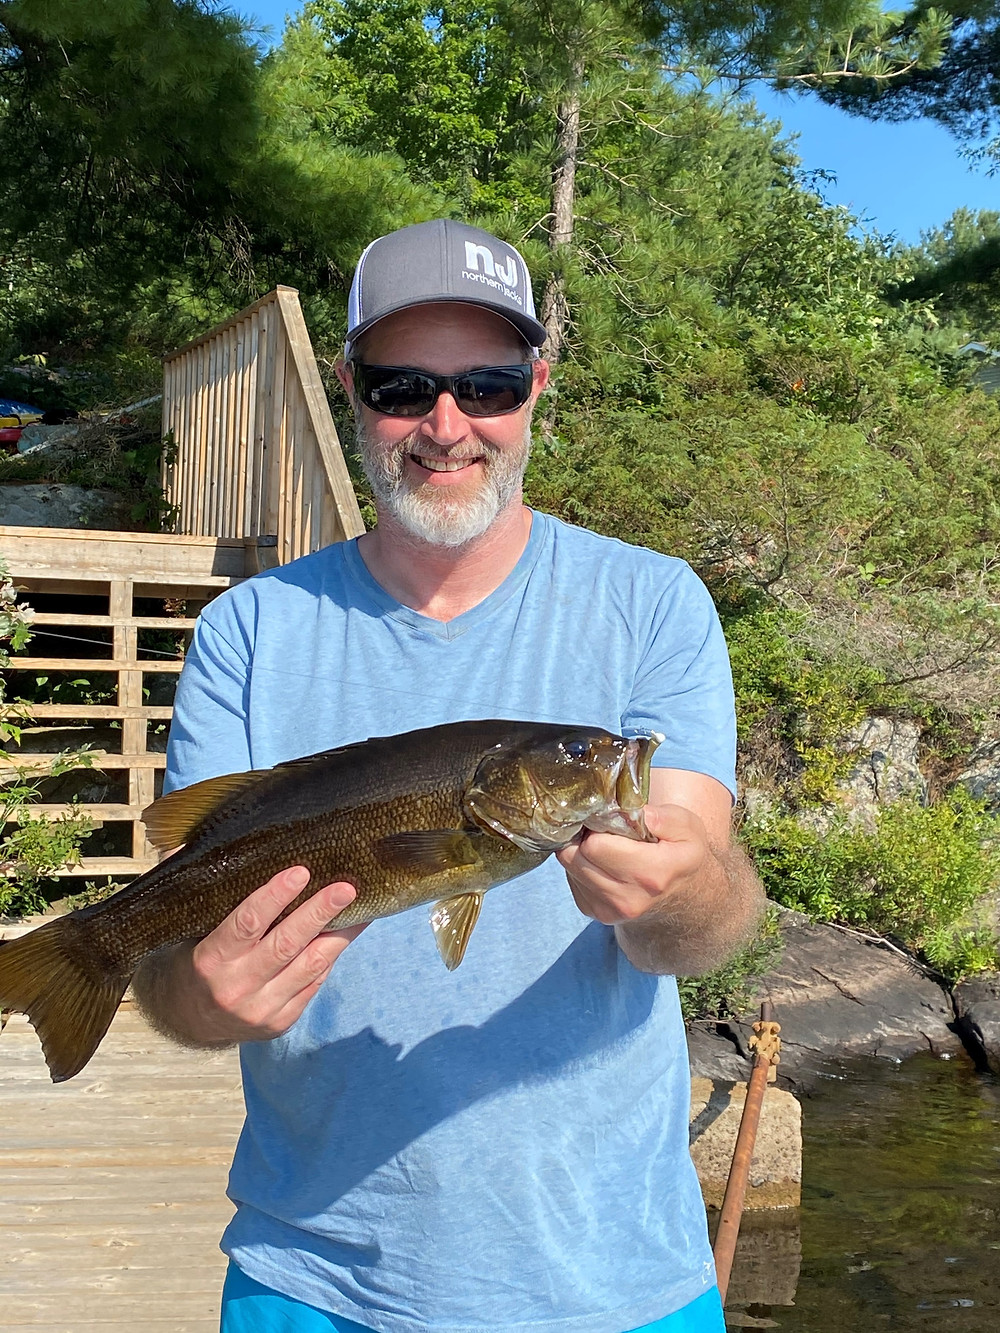 Nice bass caught in the Muskoka Region of Ontario, Canada